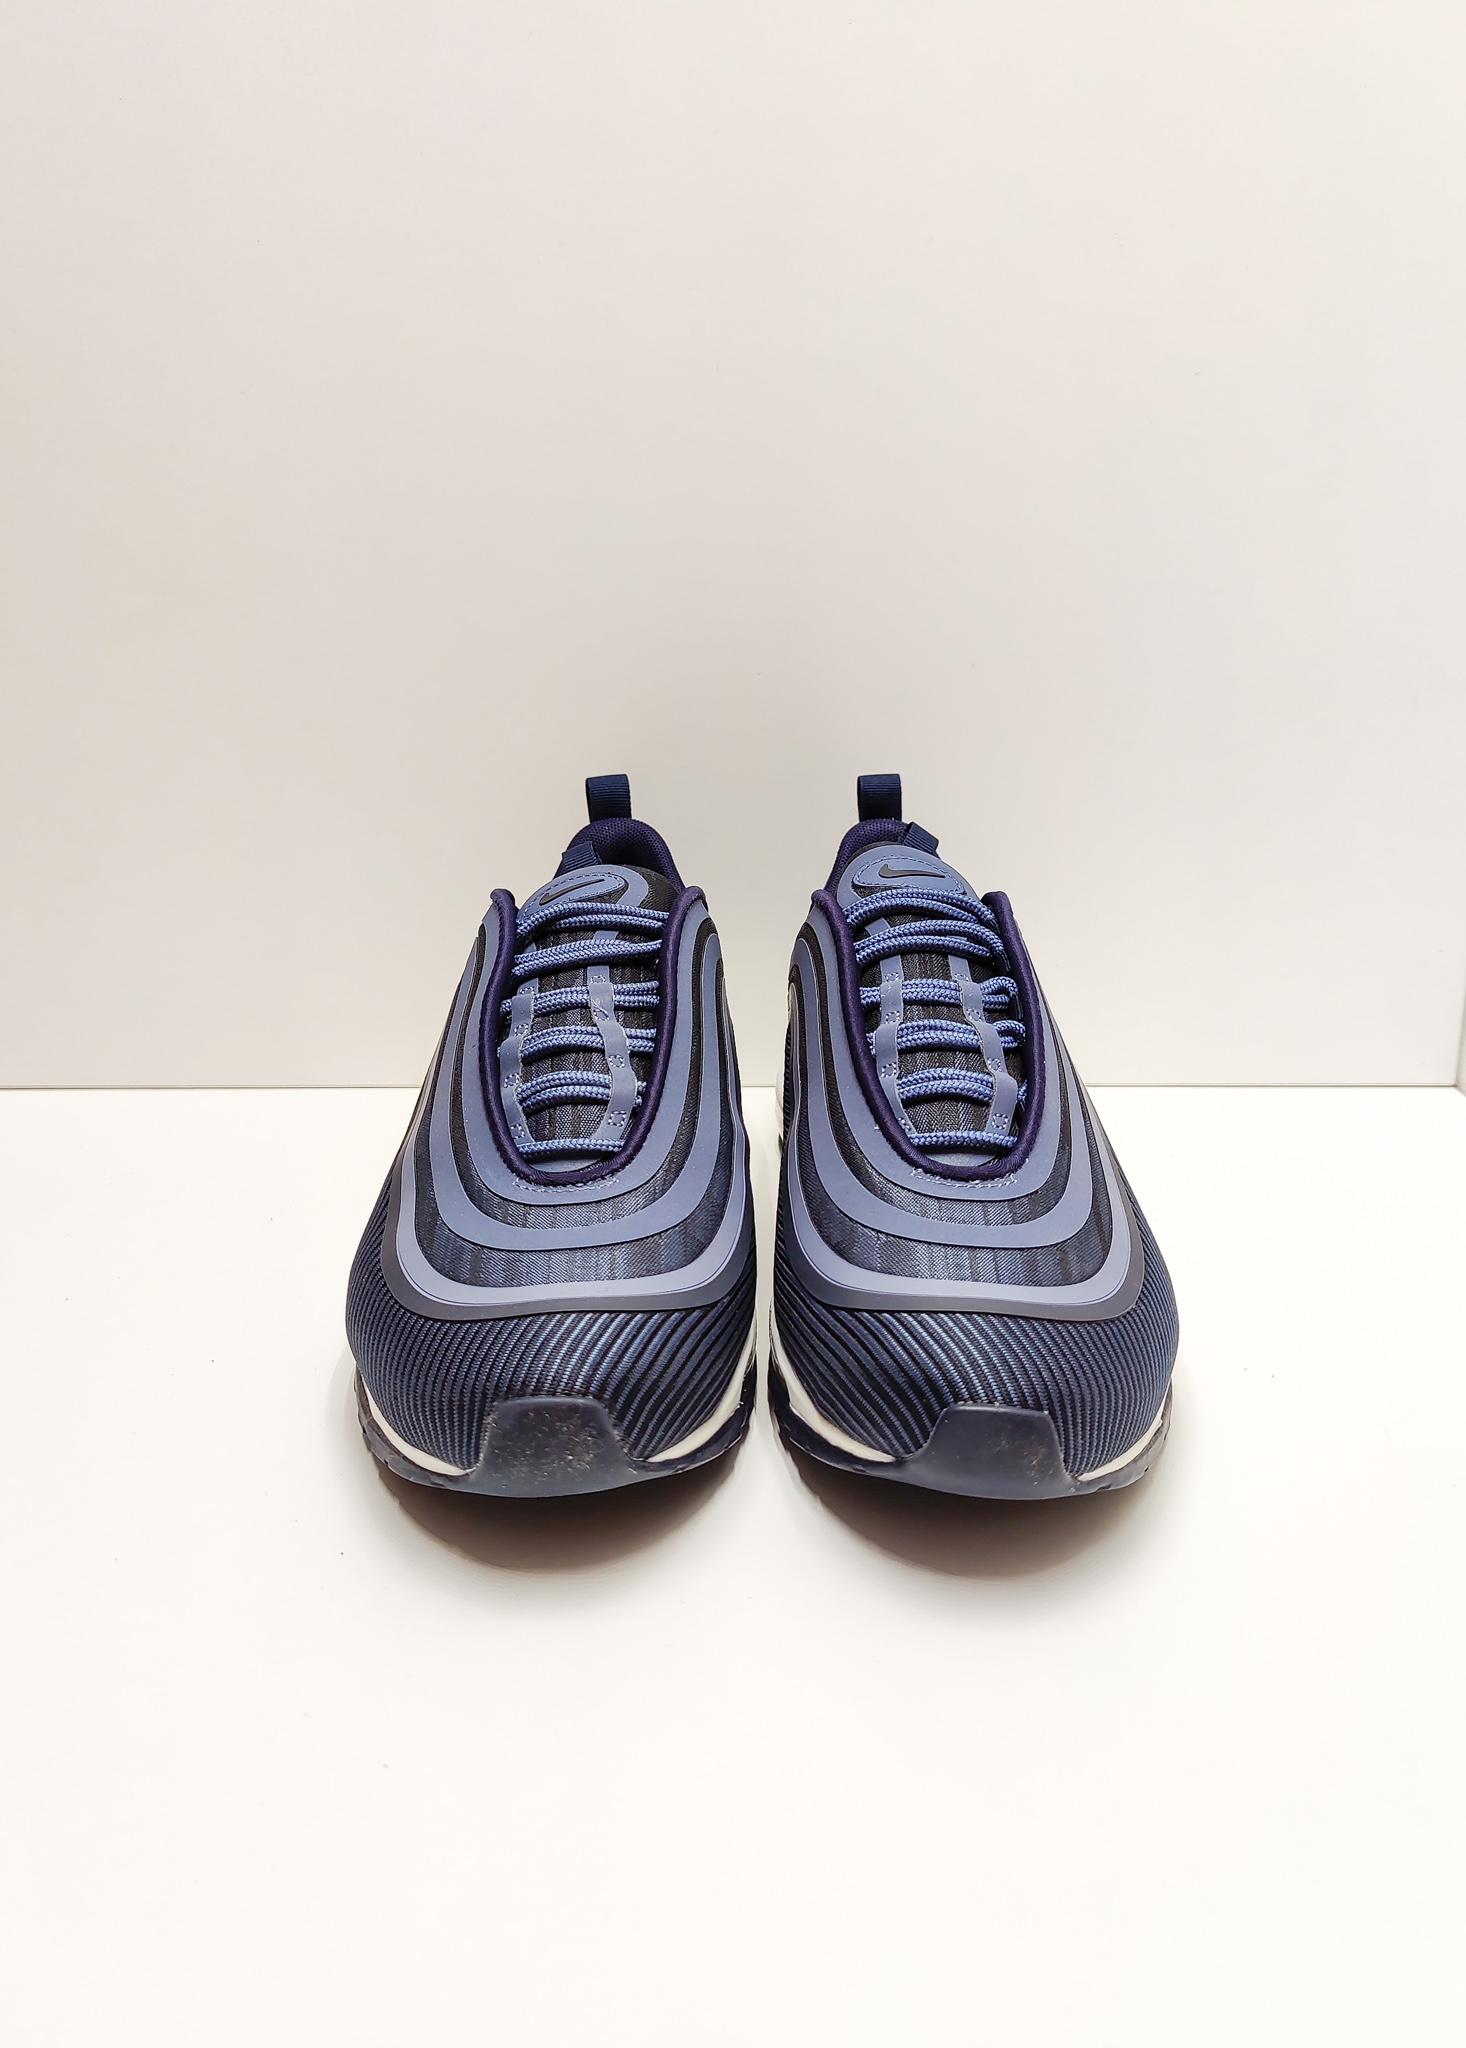 Nike Air Max 97 Ultra 17 Obsidian